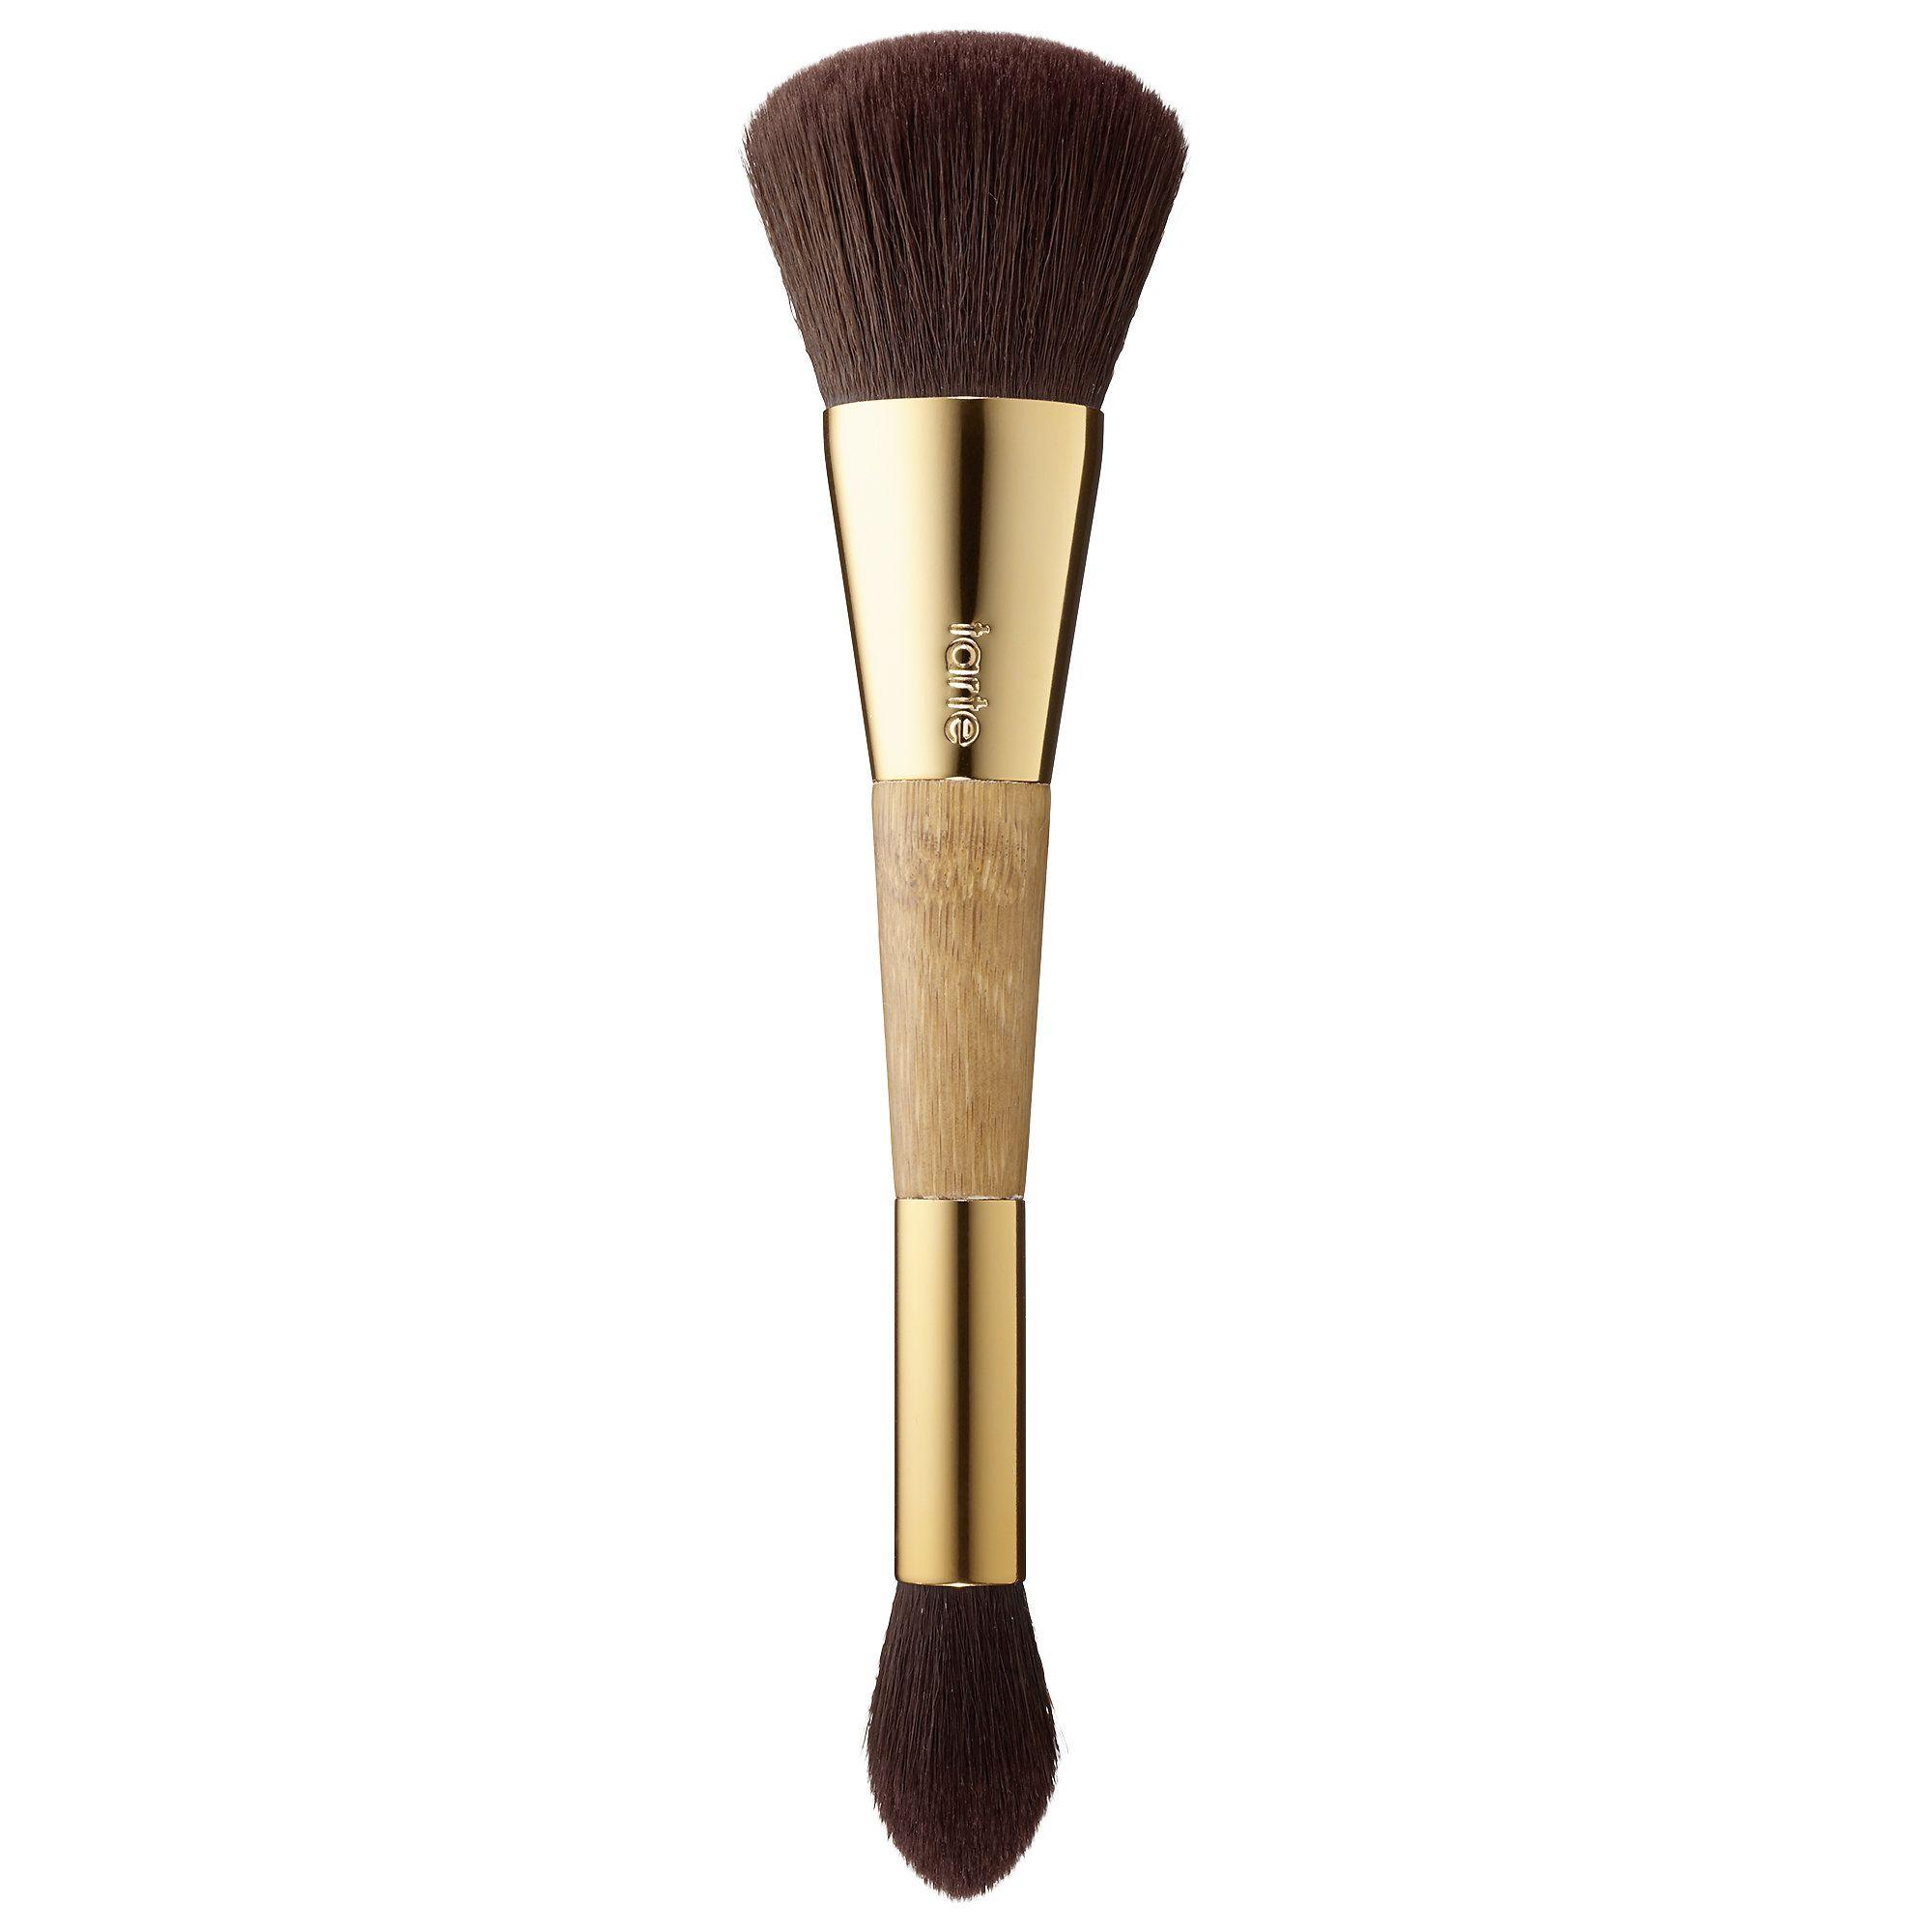 Bronze & Glow Contour Brush Contour brush, Bronzed glow